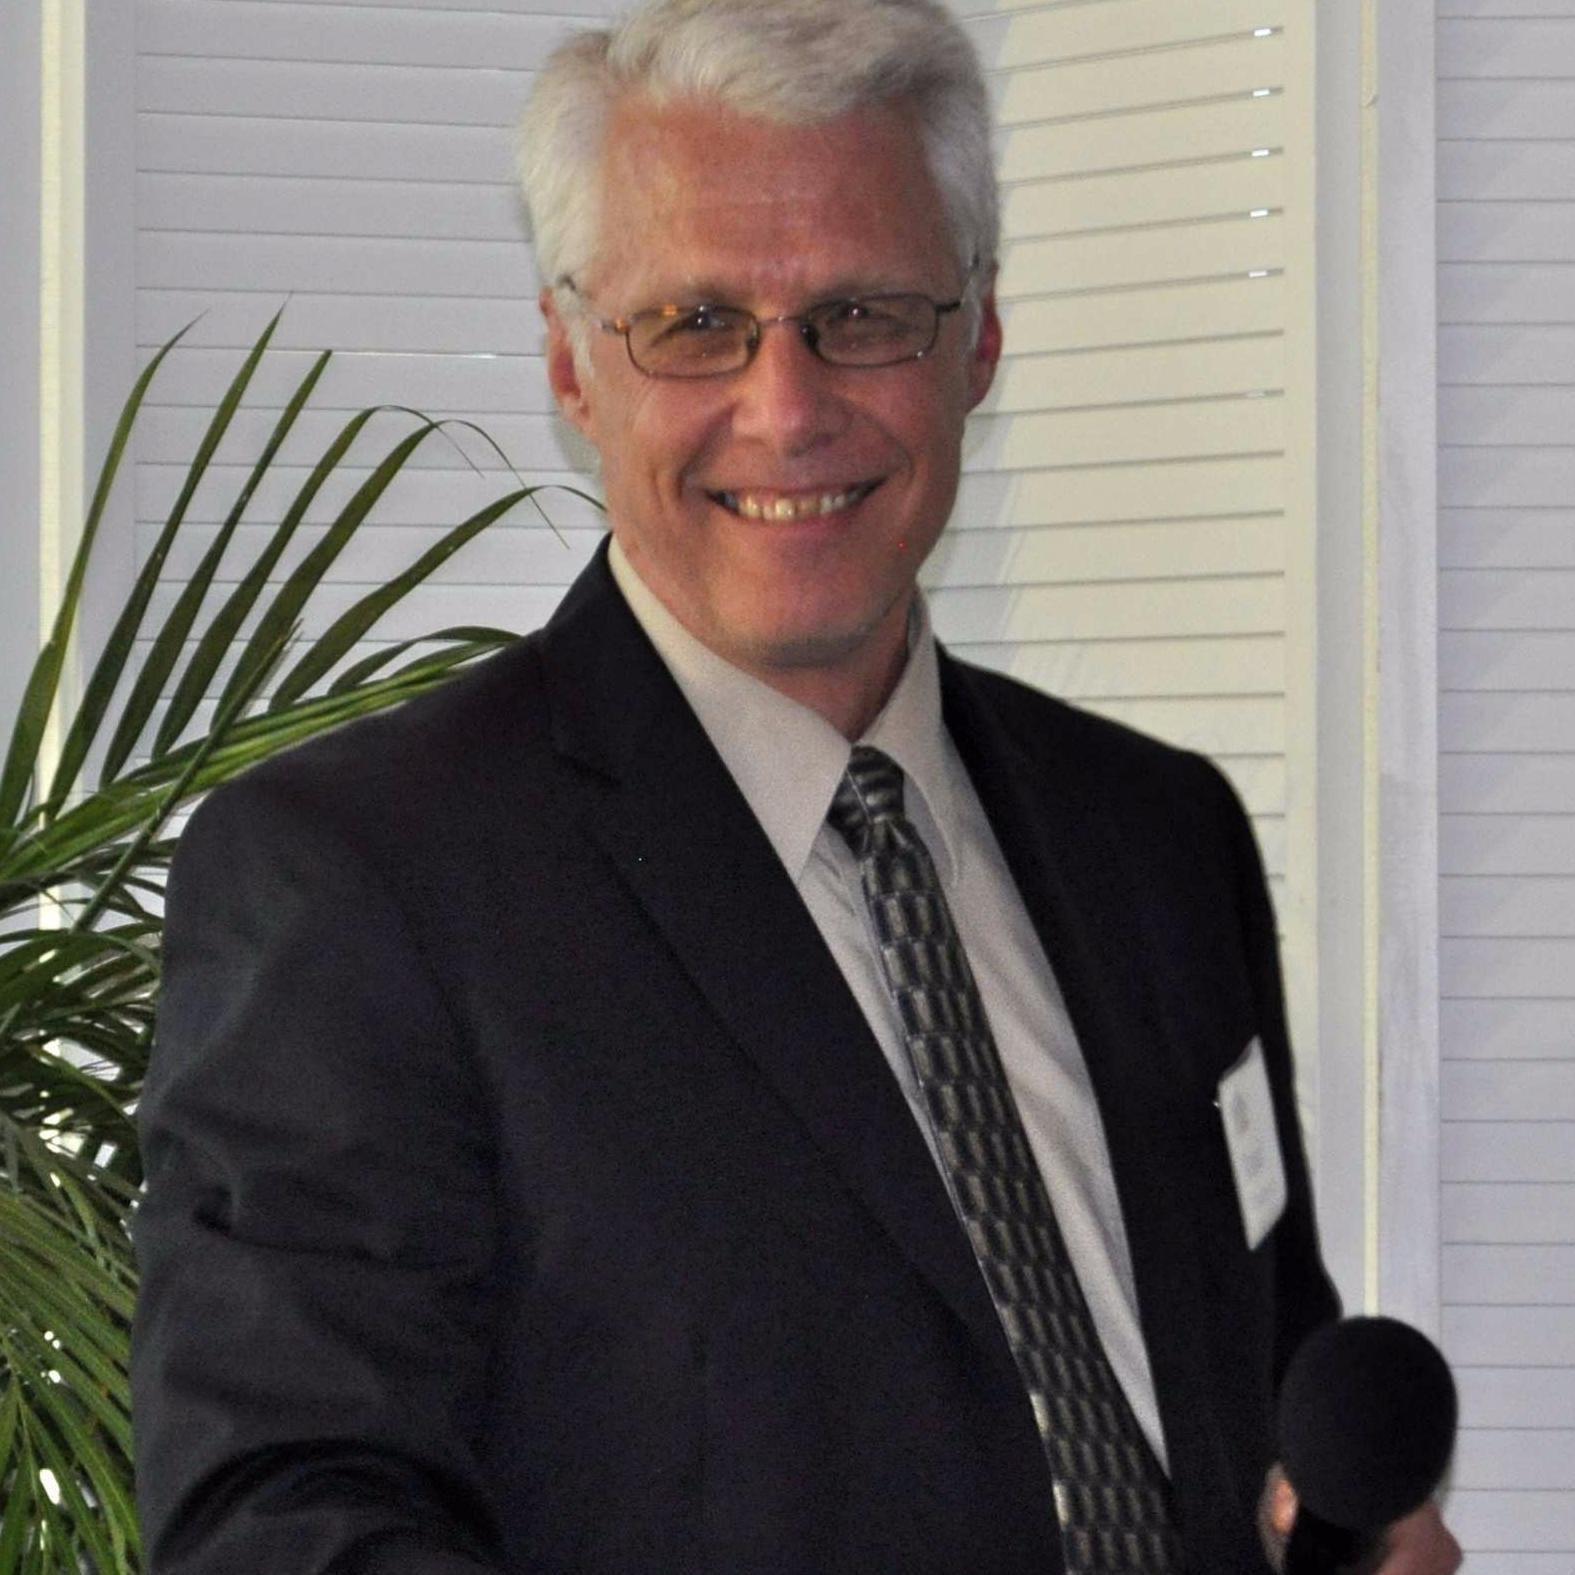 Rod Thomson